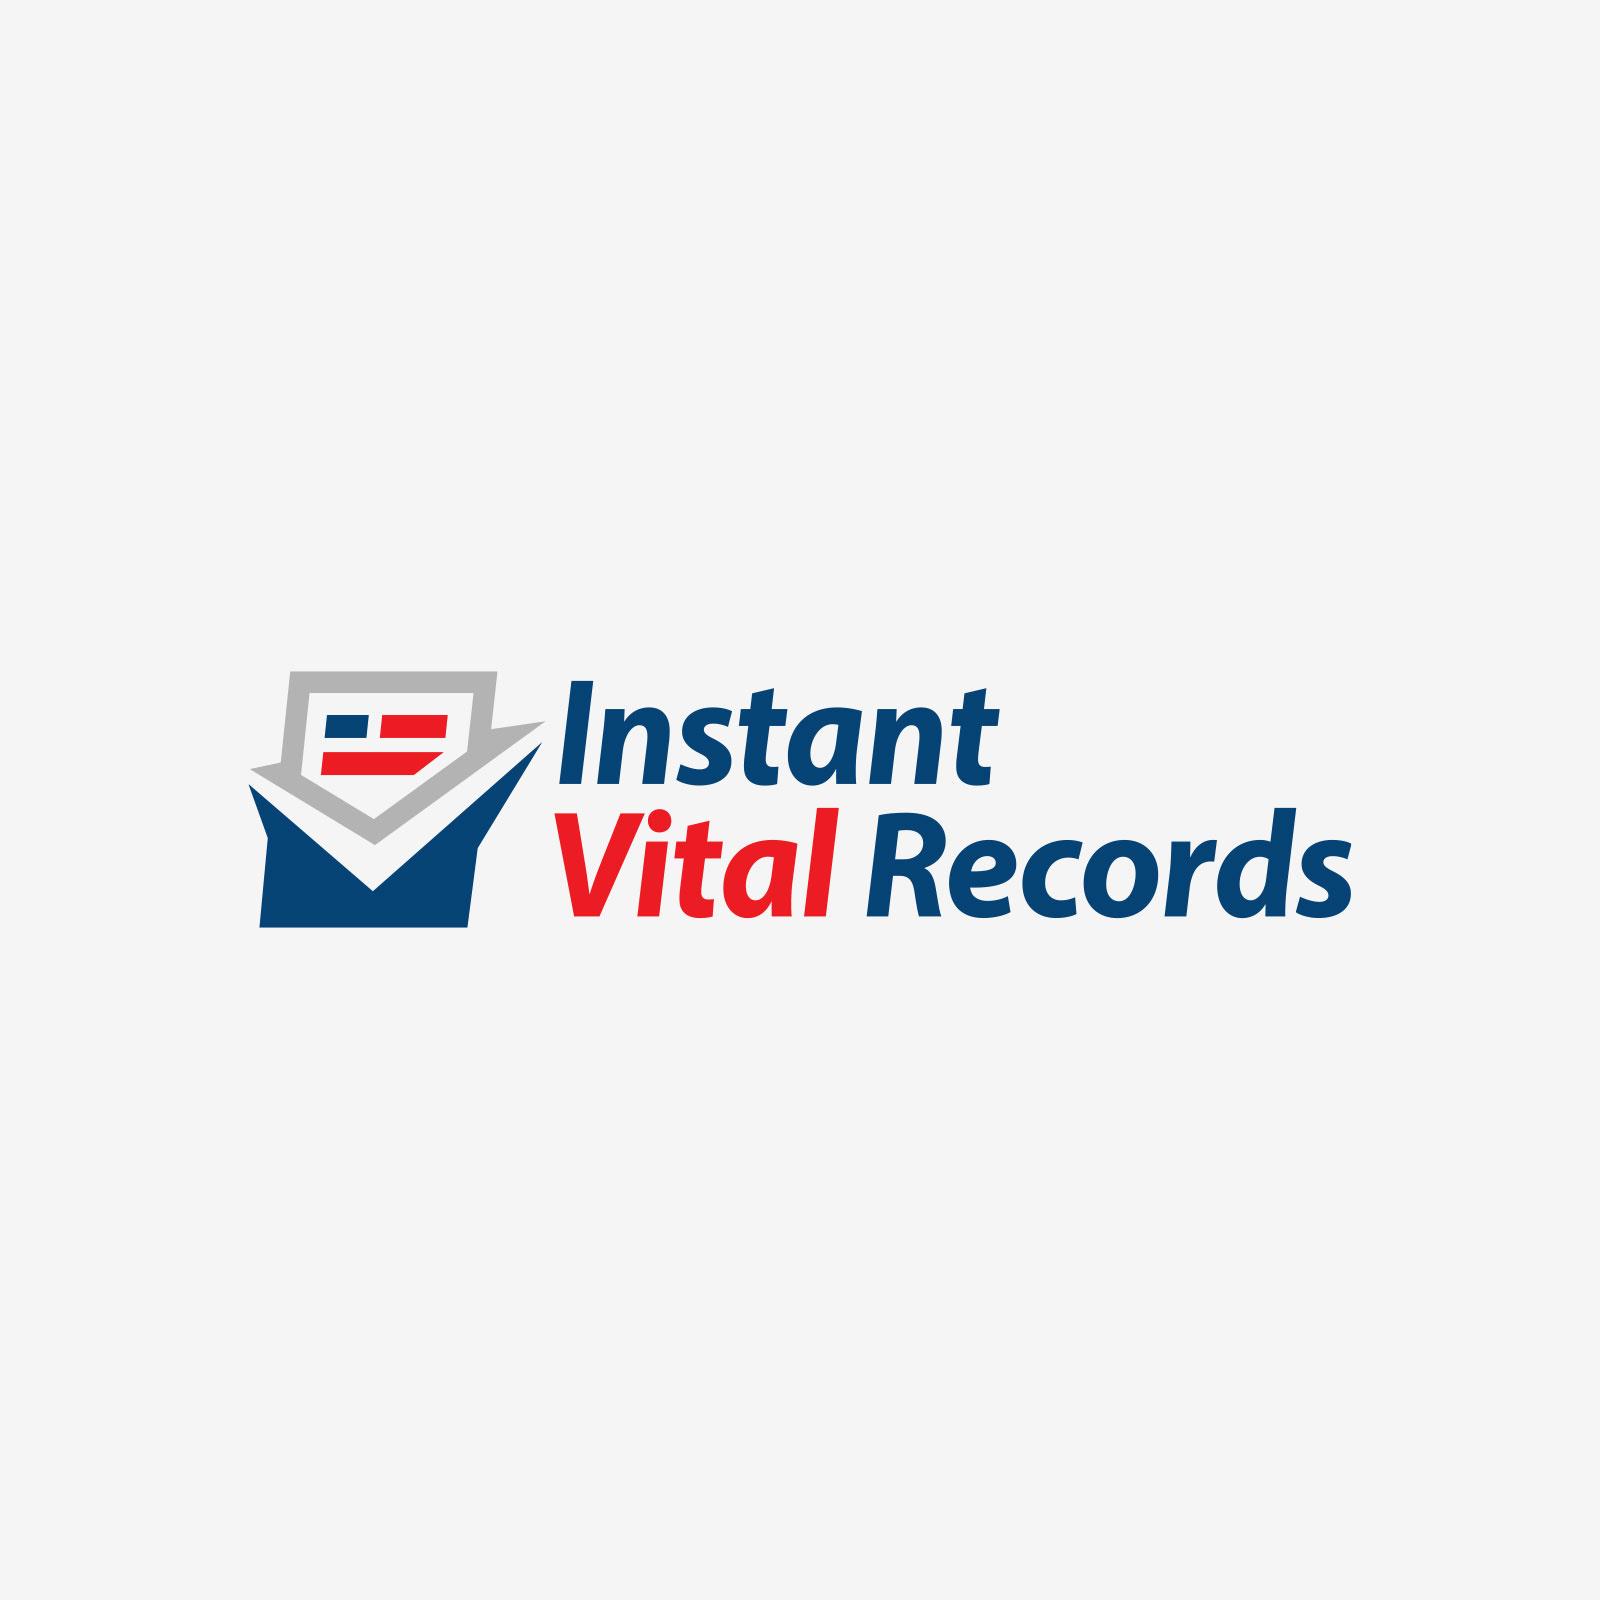 Logo design for Instant Vital Records